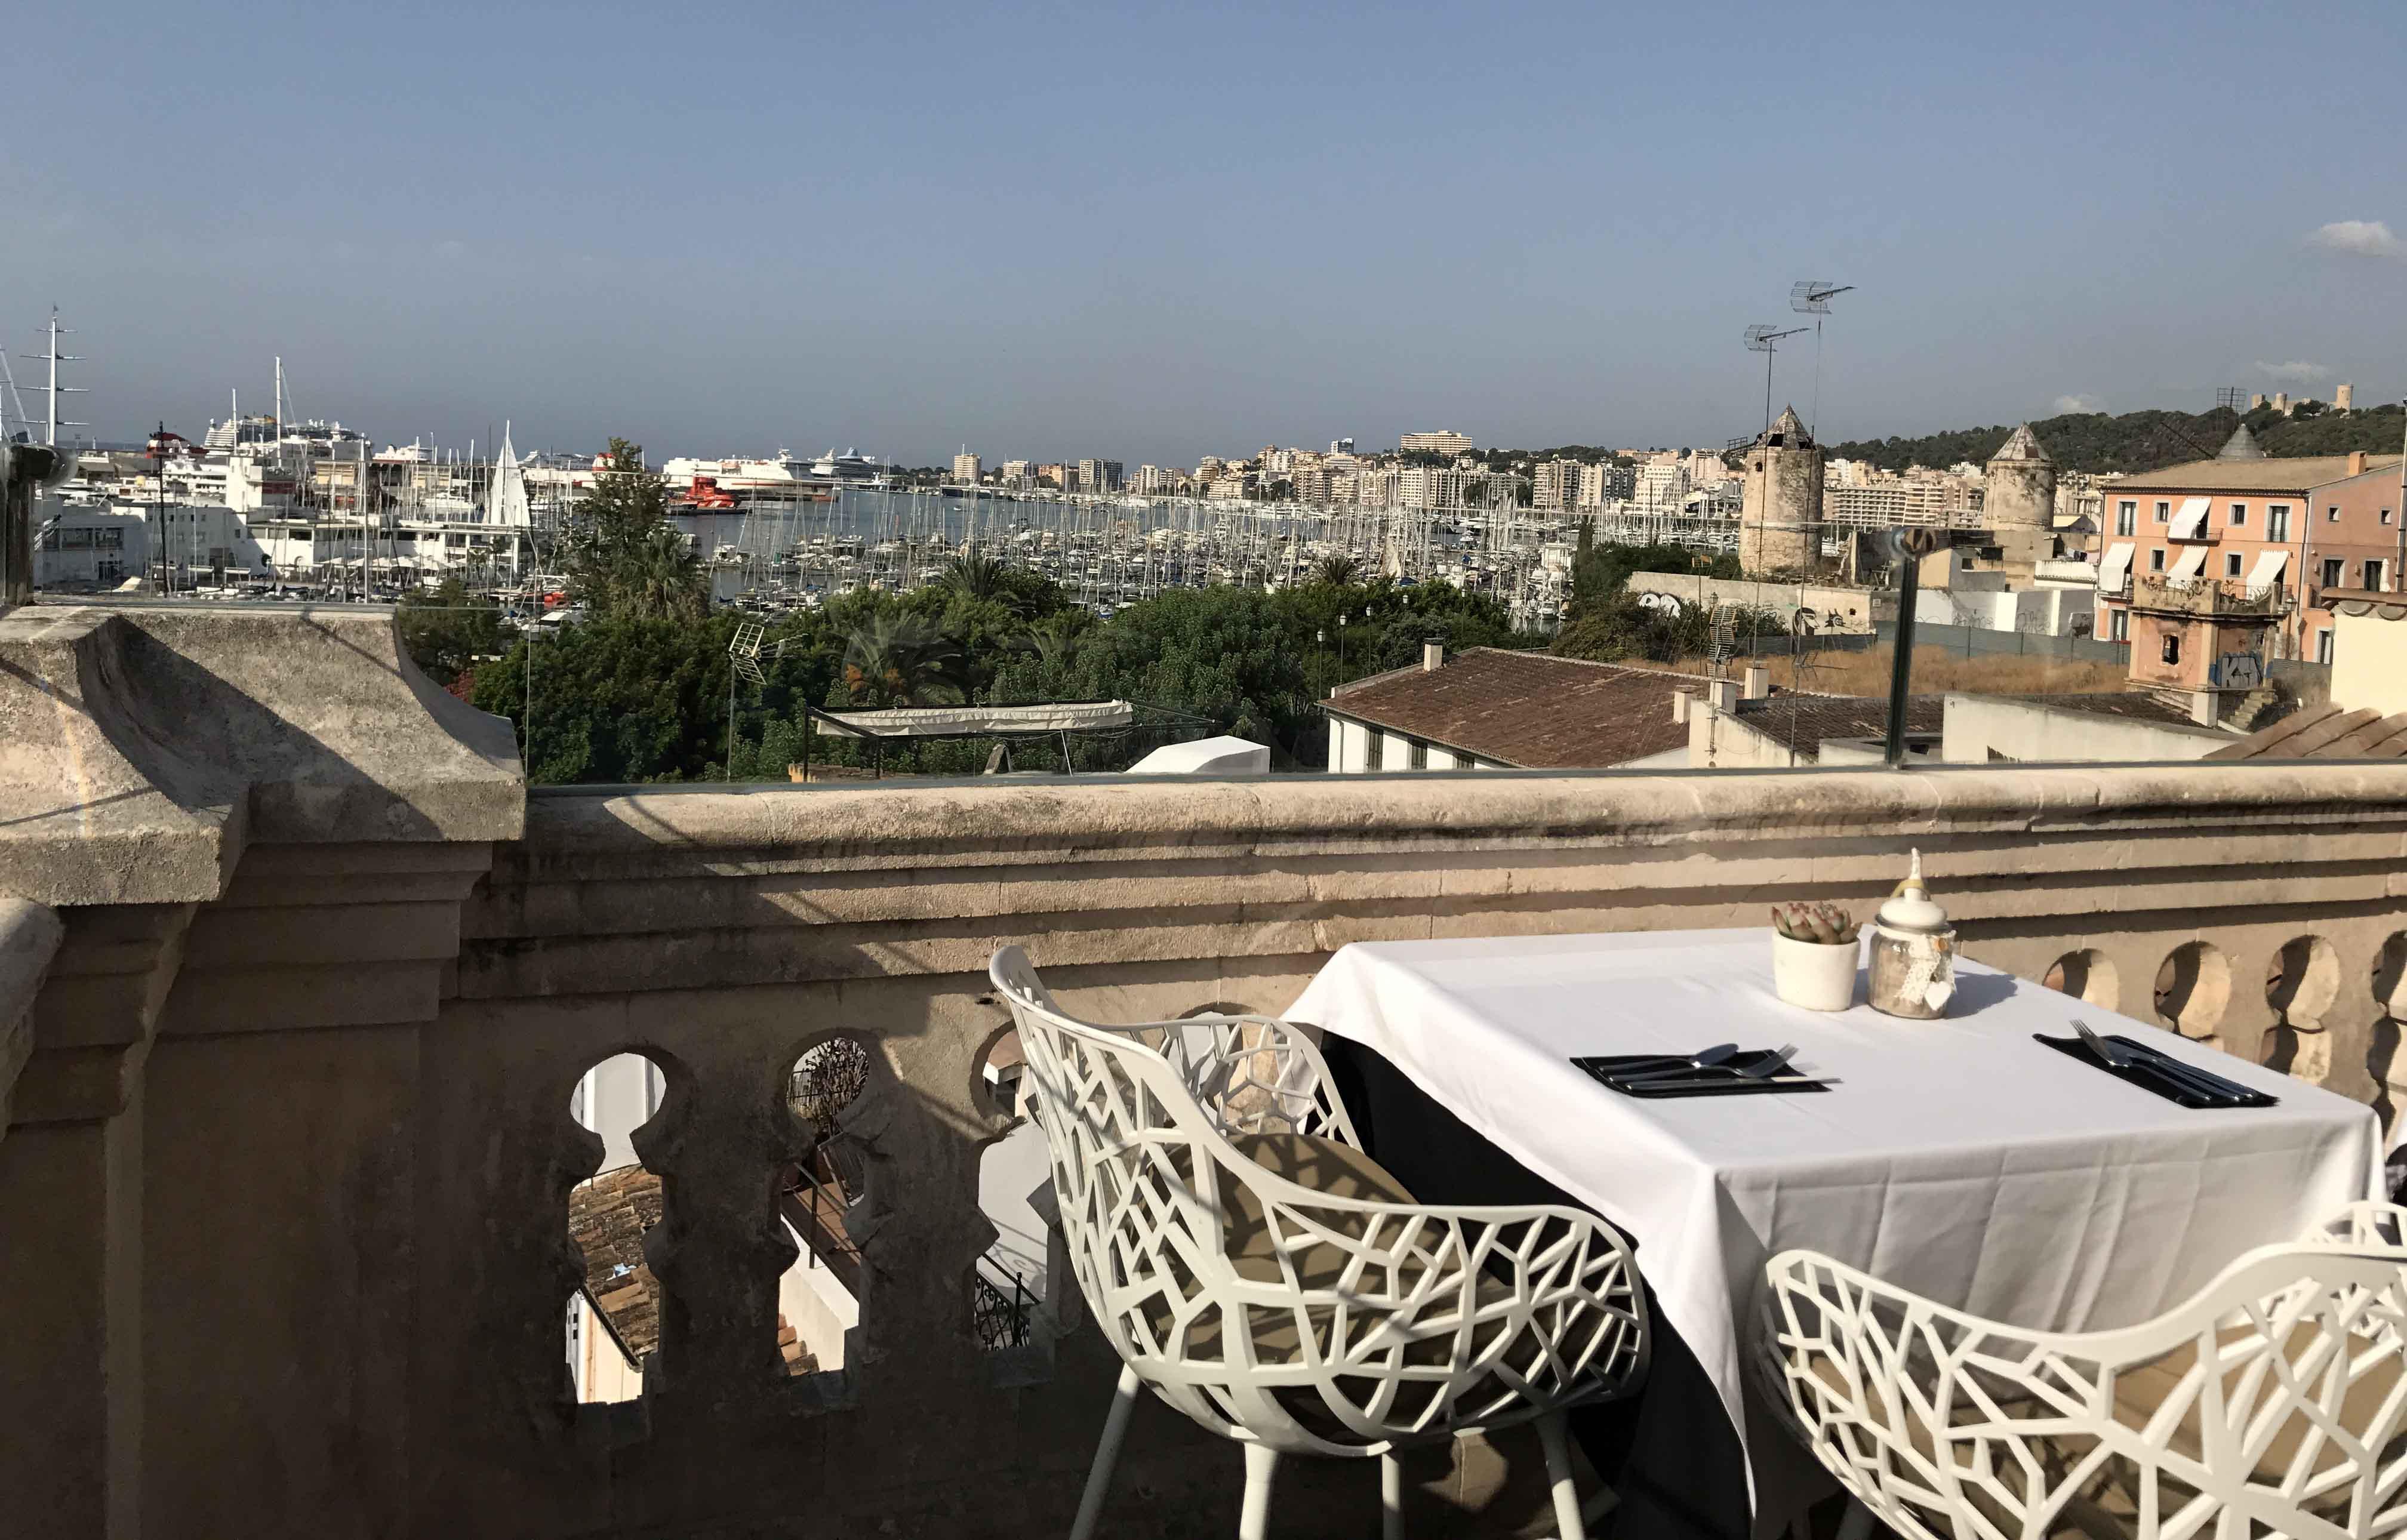 Hotel Cuba. Brunch en la terraza skybar rooftop del Hostal Cuba. Palma de Mallorca.